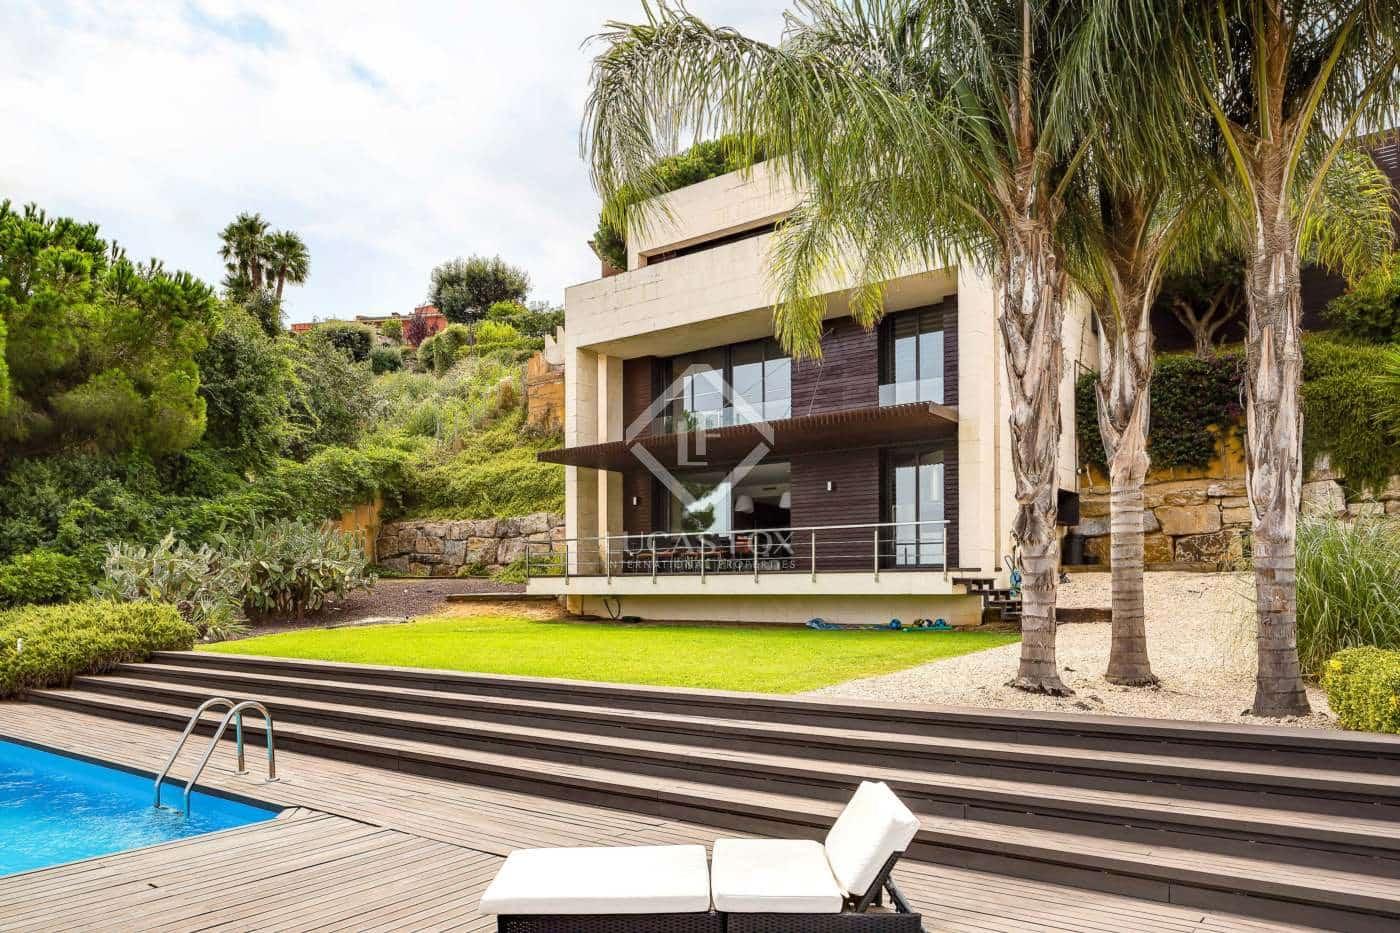 4 bedroom Villa for sale in Sant Andreu de Llavaneres with pool garage - € 895,000 (Ref: 4151123)